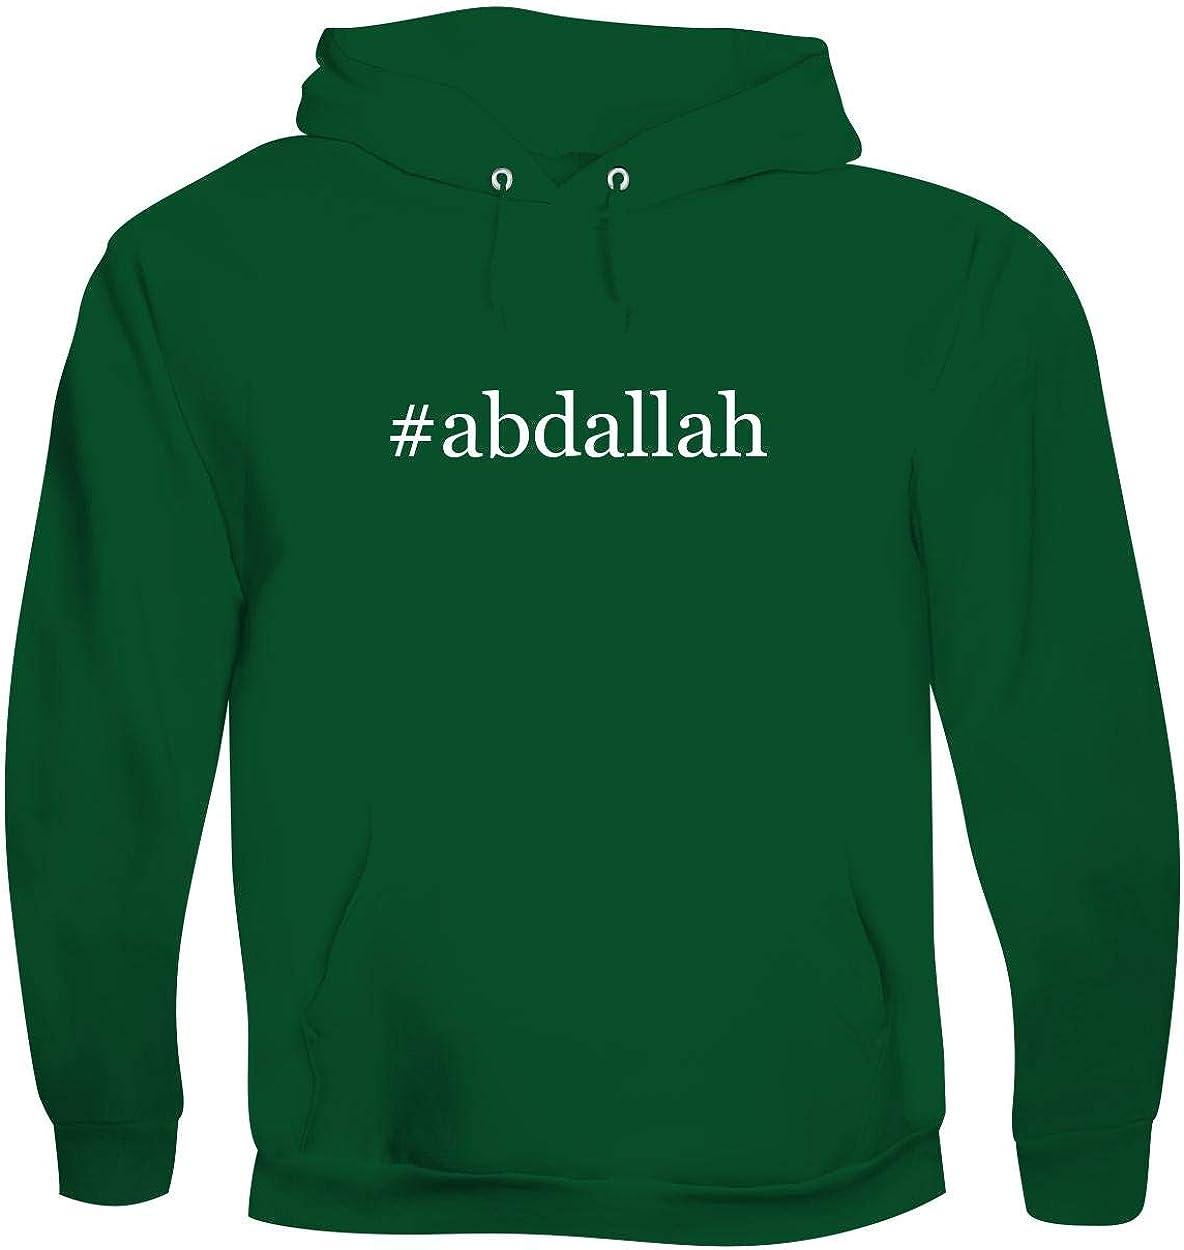 #abdallah - Men's Hashtag Soft & Comfortable Hoodie Sweatshirt Pullover 51PyH%2B8O0IL